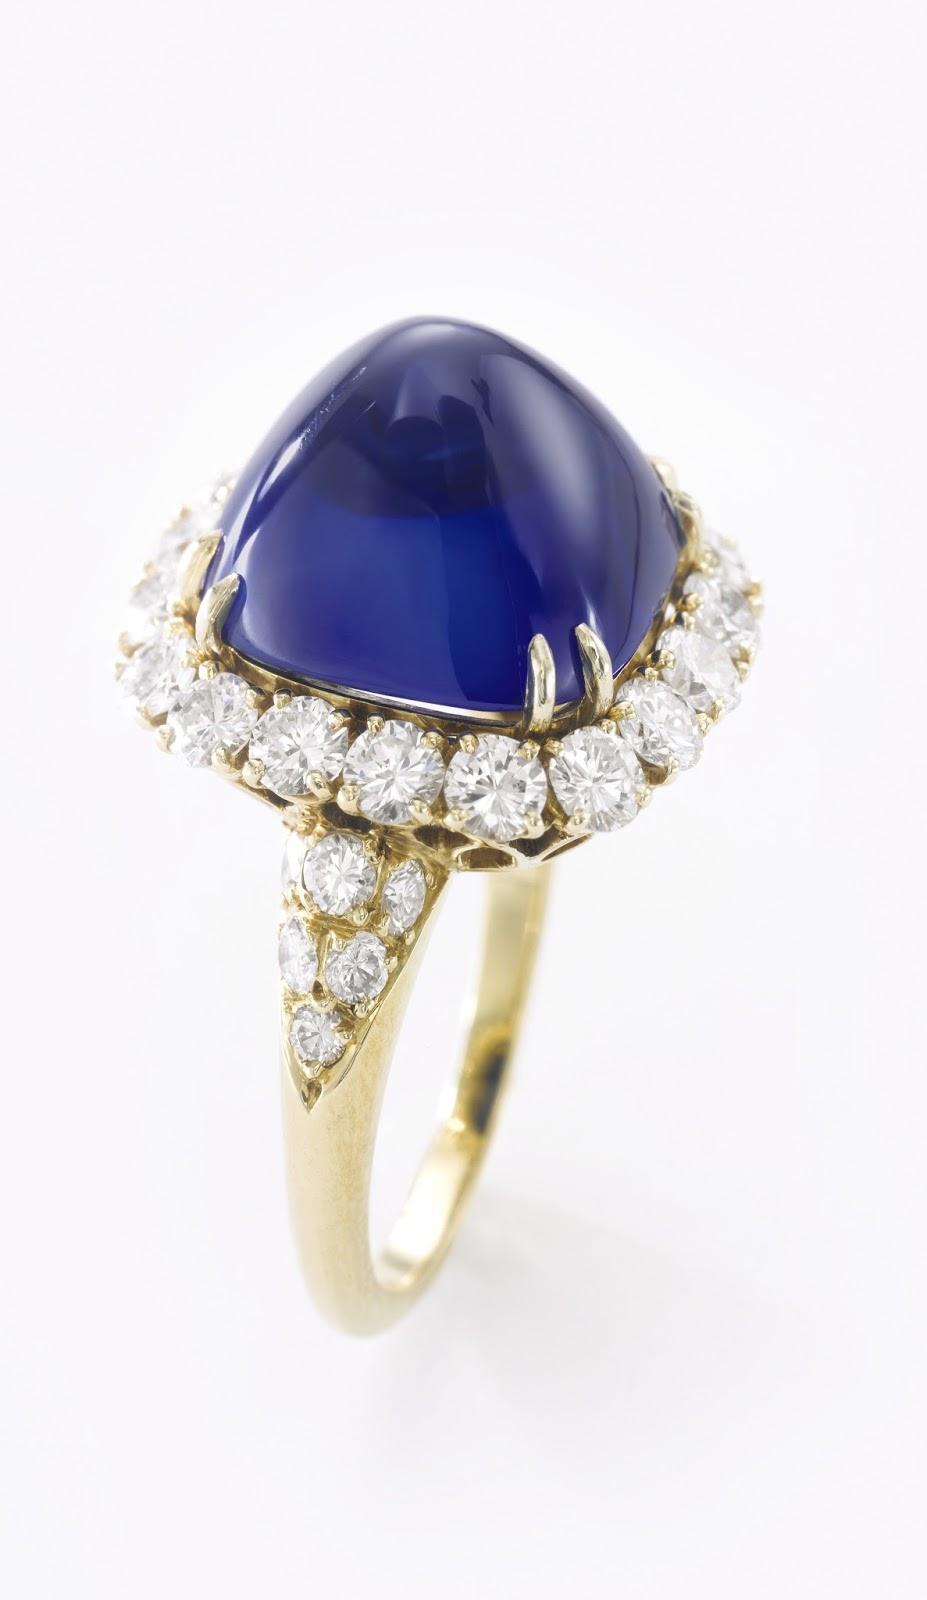 Lot 419 - Fine Kashmir sapphire and diamond ring - 15.34 carats